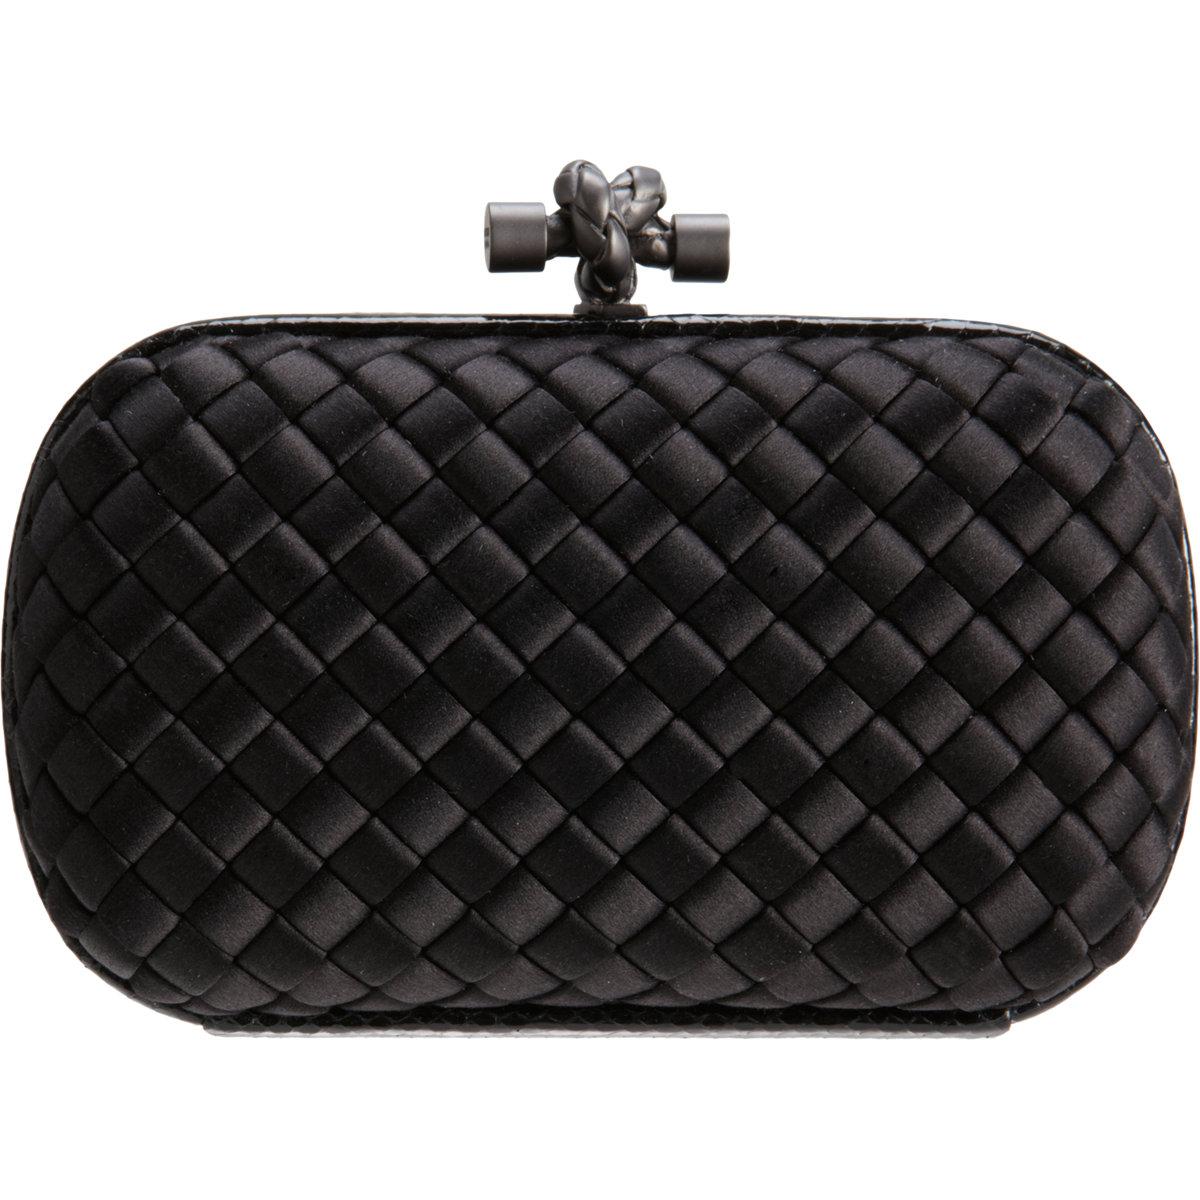 lyst bottega veneta intreccio impero clutch in black. Black Bedroom Furniture Sets. Home Design Ideas